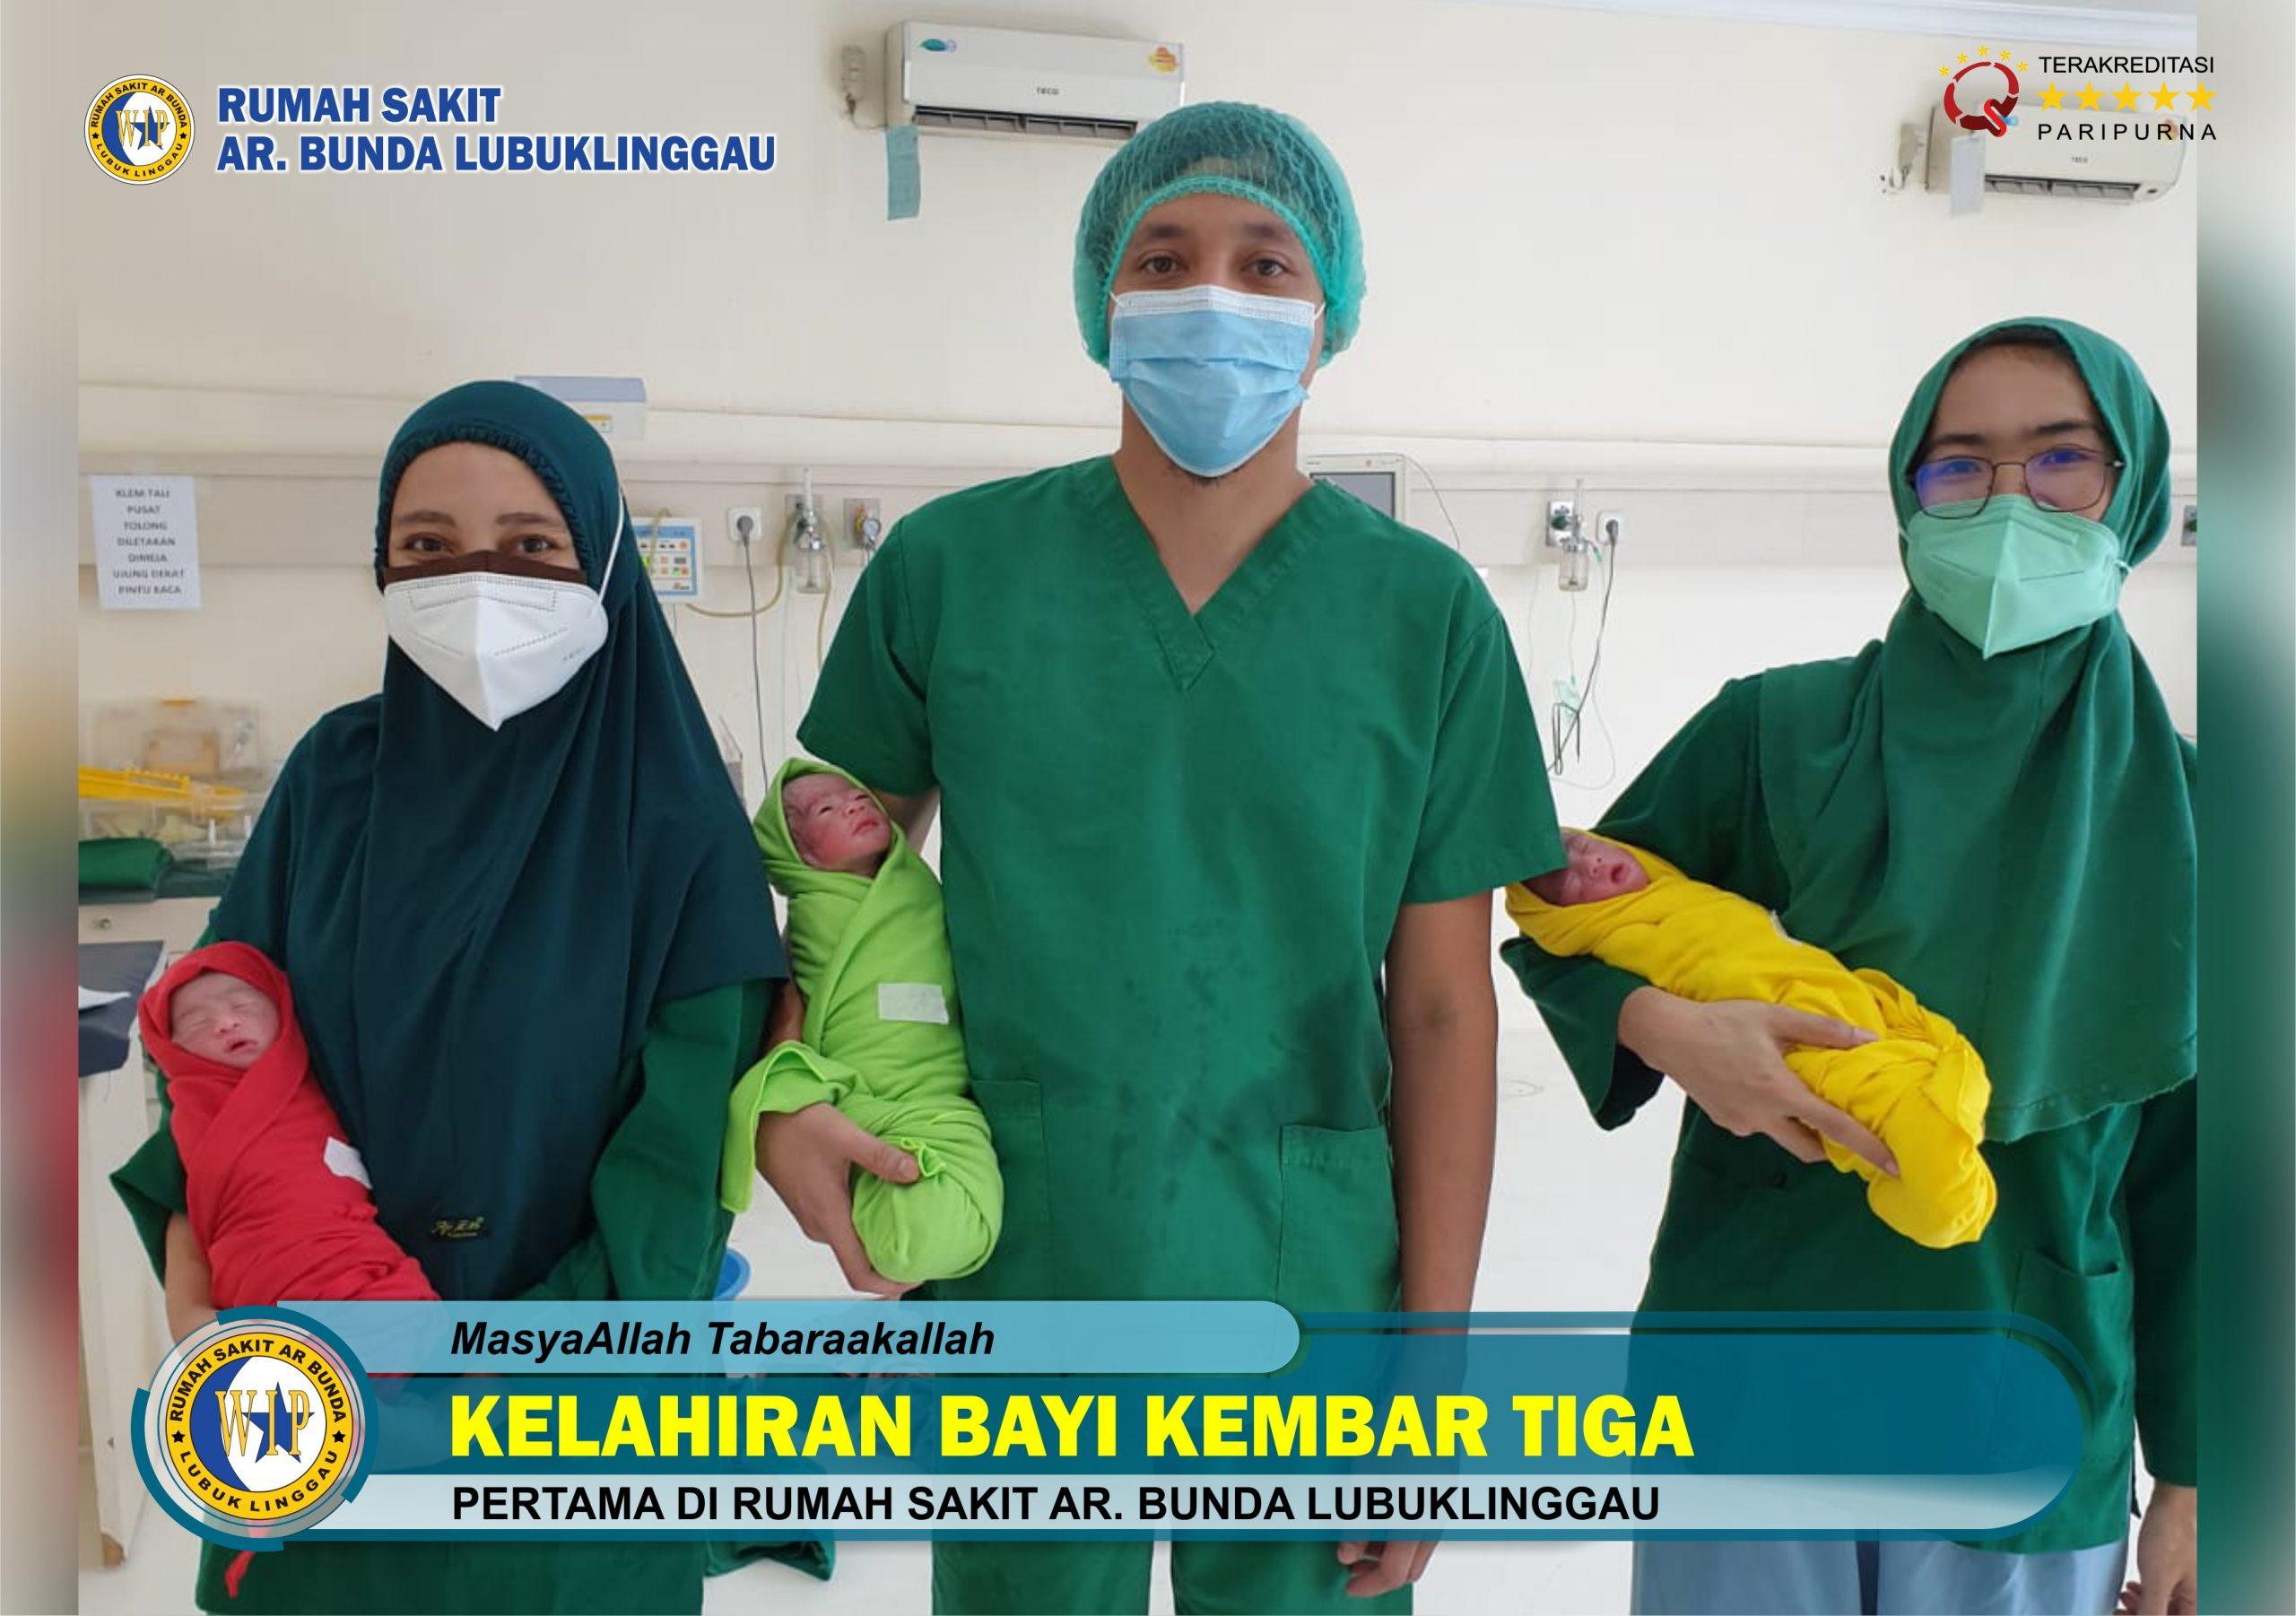 Kelahiran Bayi Kembar 3 Pertama